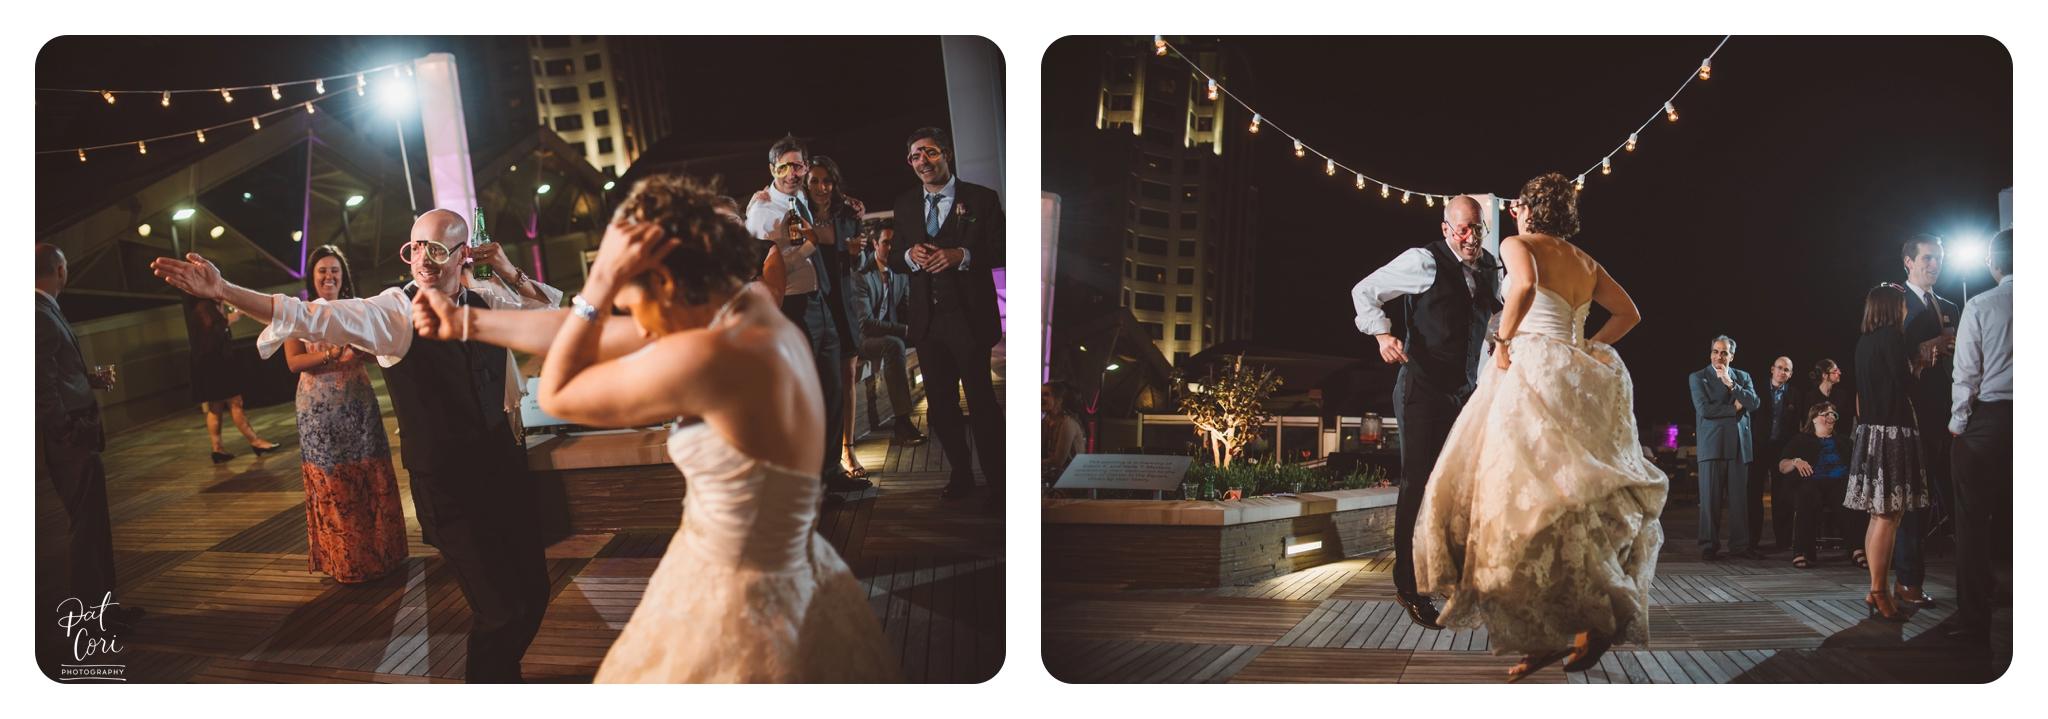 Center-in-the-Square-_-Weddings-Wedding-Photographer-Virginia-049.jpg